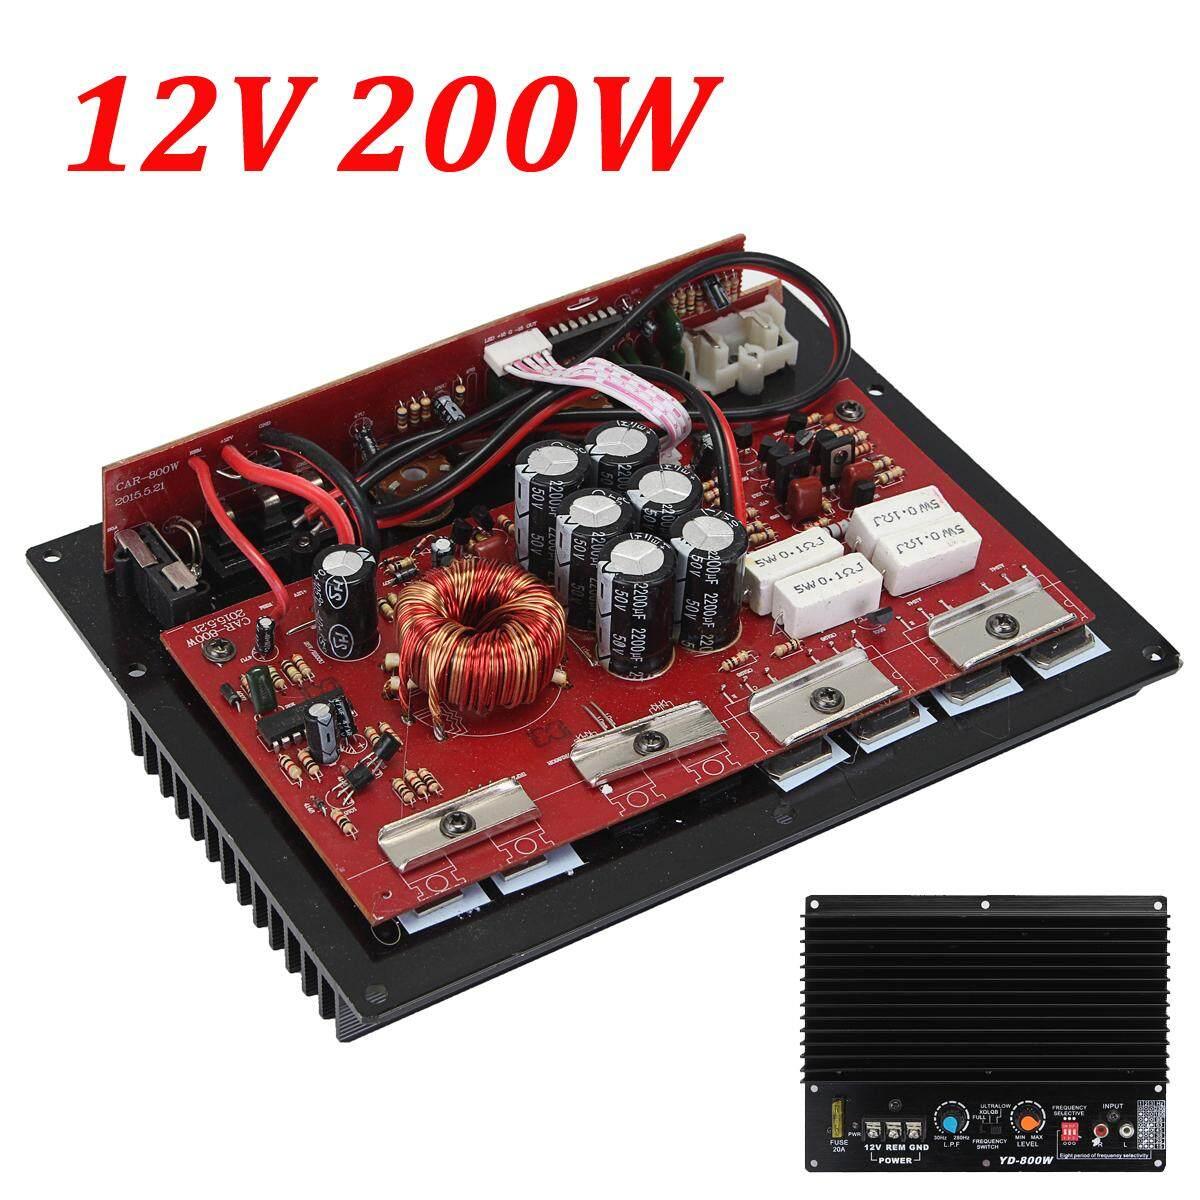 DIY Amplifier Transistor Type A1694 C4467 C5198 A1941 ...